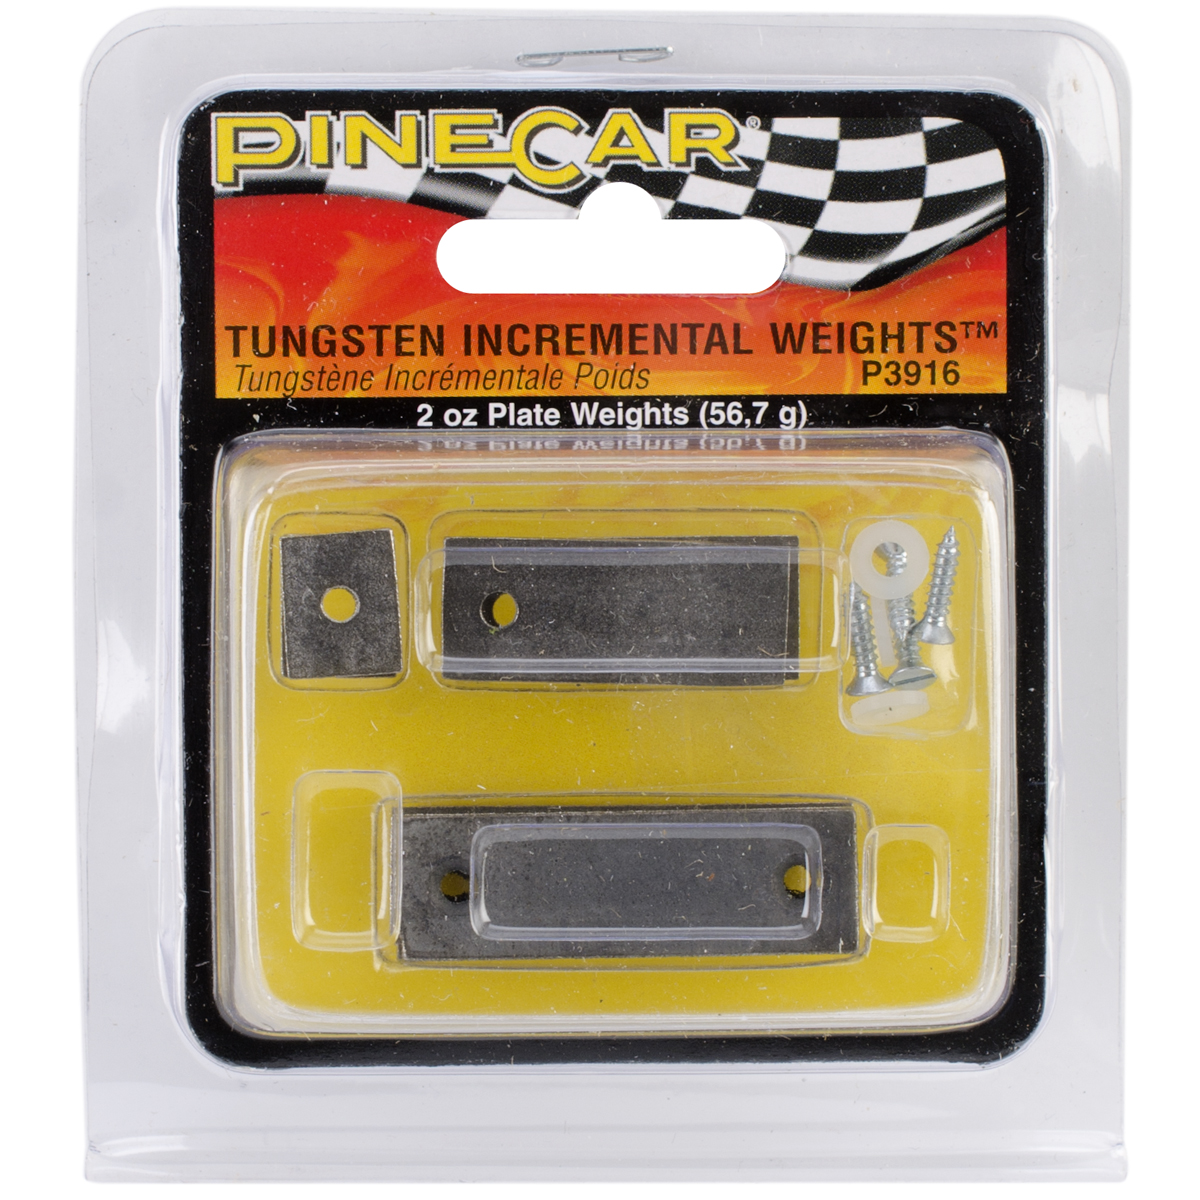 Pine Car Derby Weights 2 Ounces-Tungsten Incremental Plate